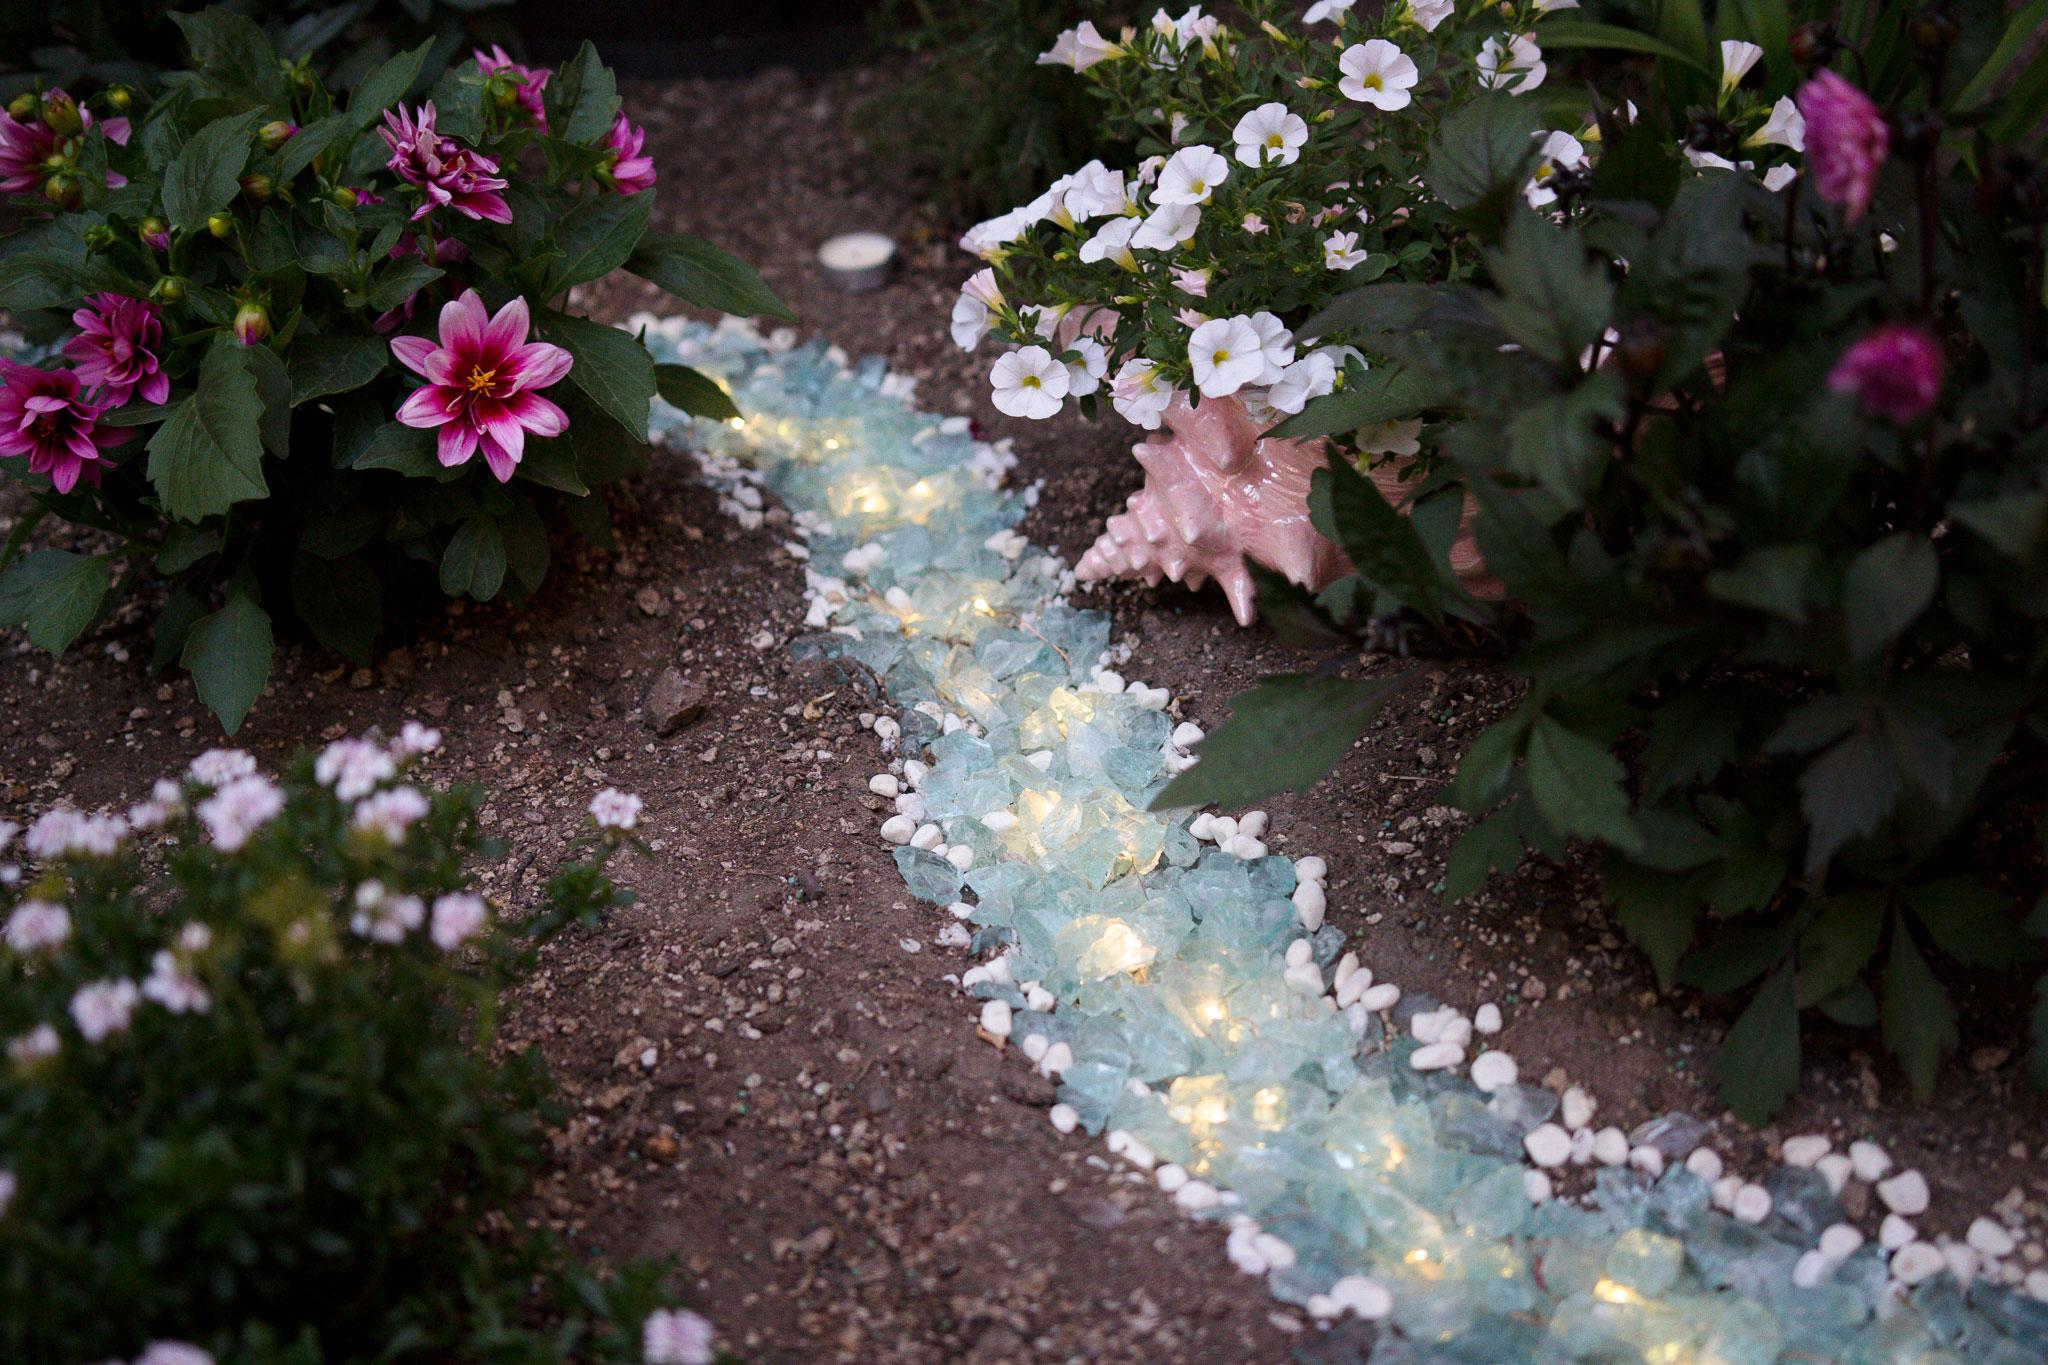 Adelya_Tumasyeva_the-garden-project_30.jpg